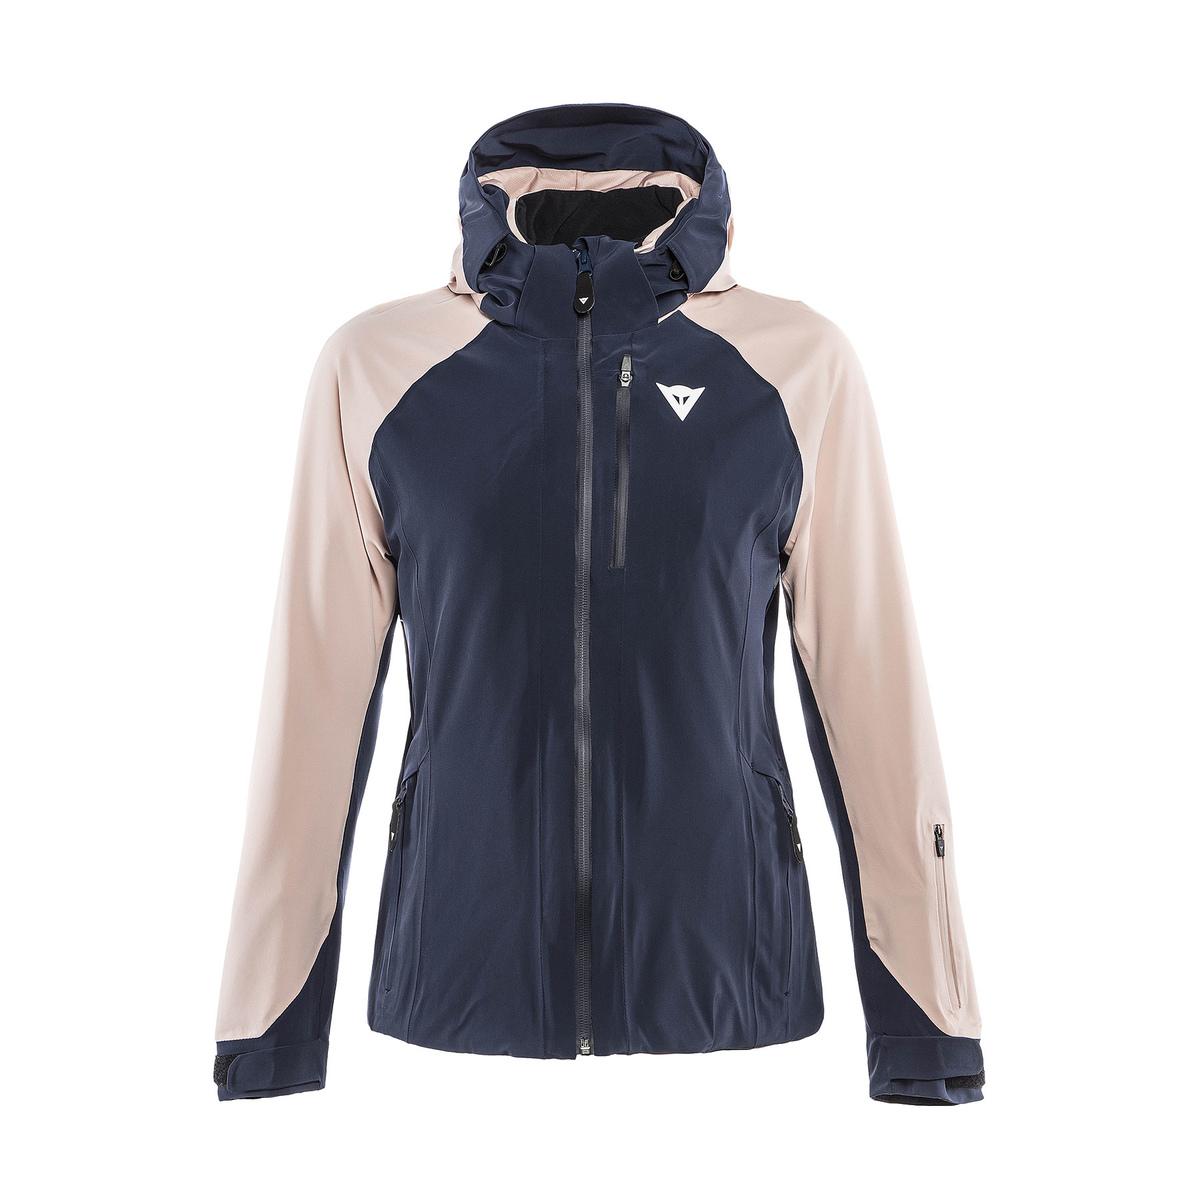 Prezzi Dainese giacca hp2 l2.1 donna